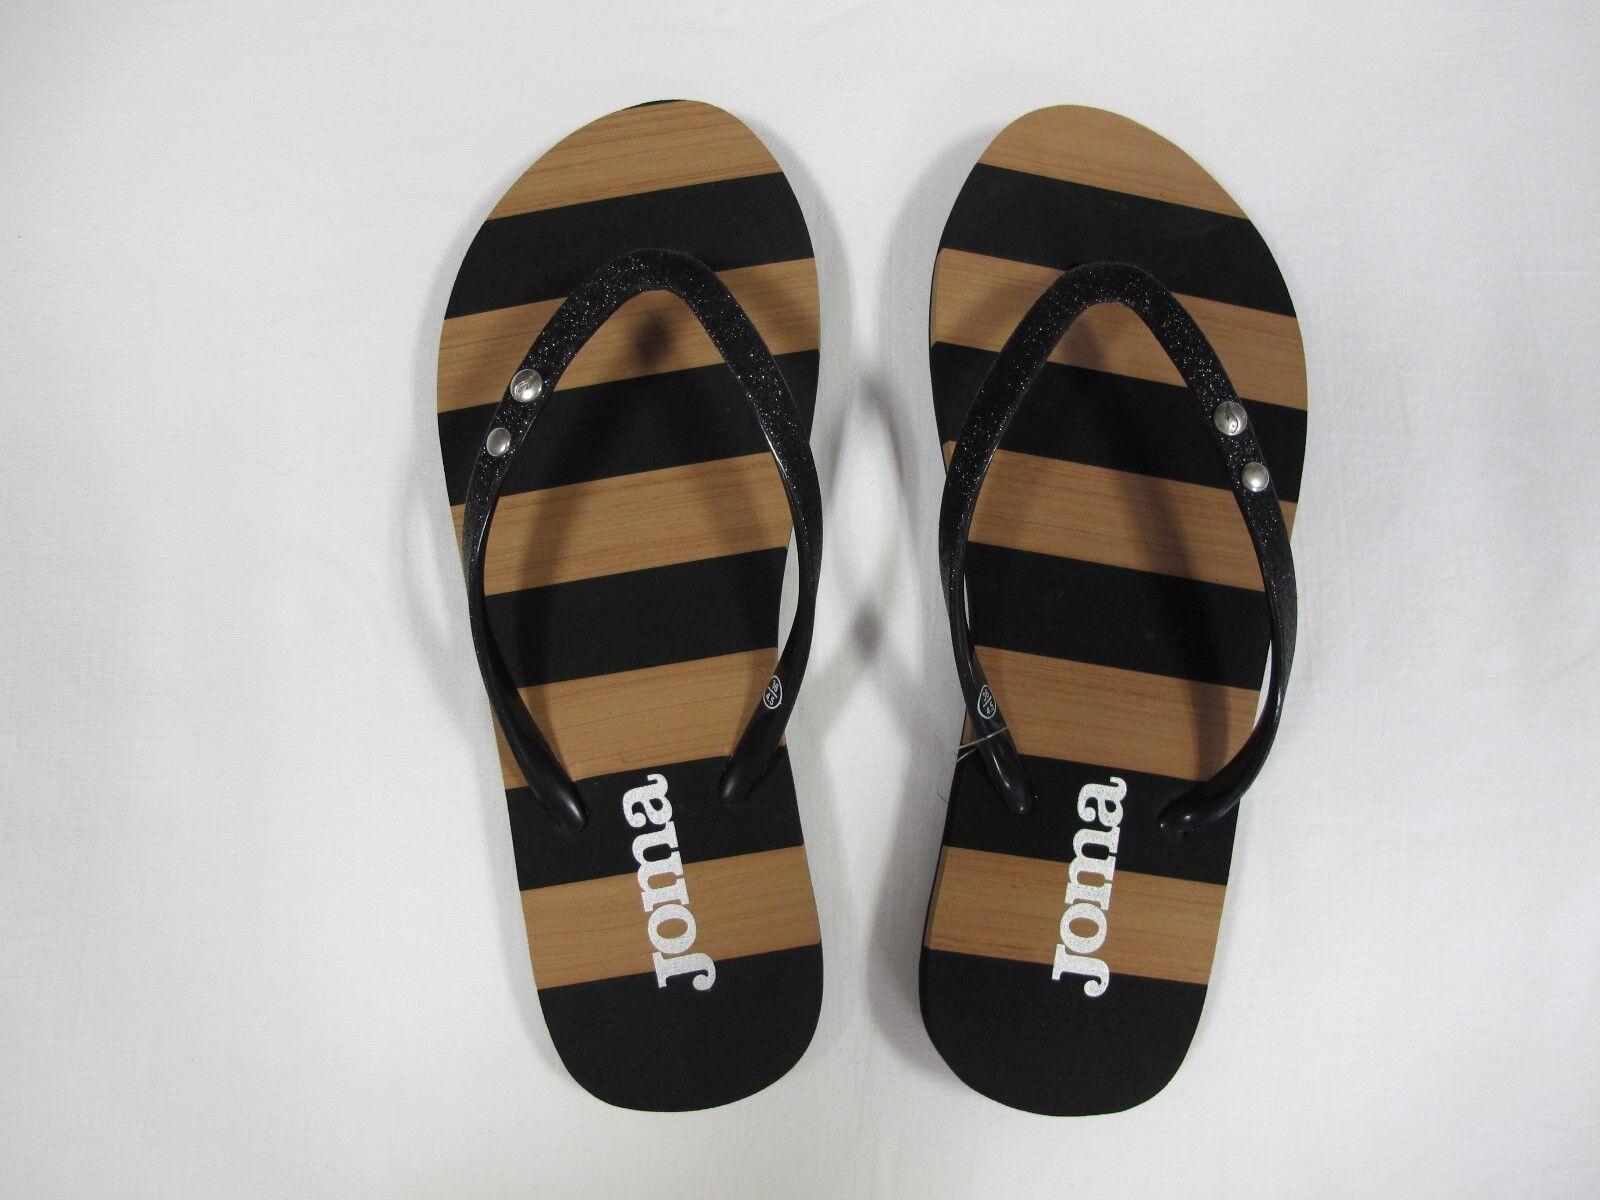 JOMA sandals womens flip flops S. COSTA LADY 701 BLACK summer 2017